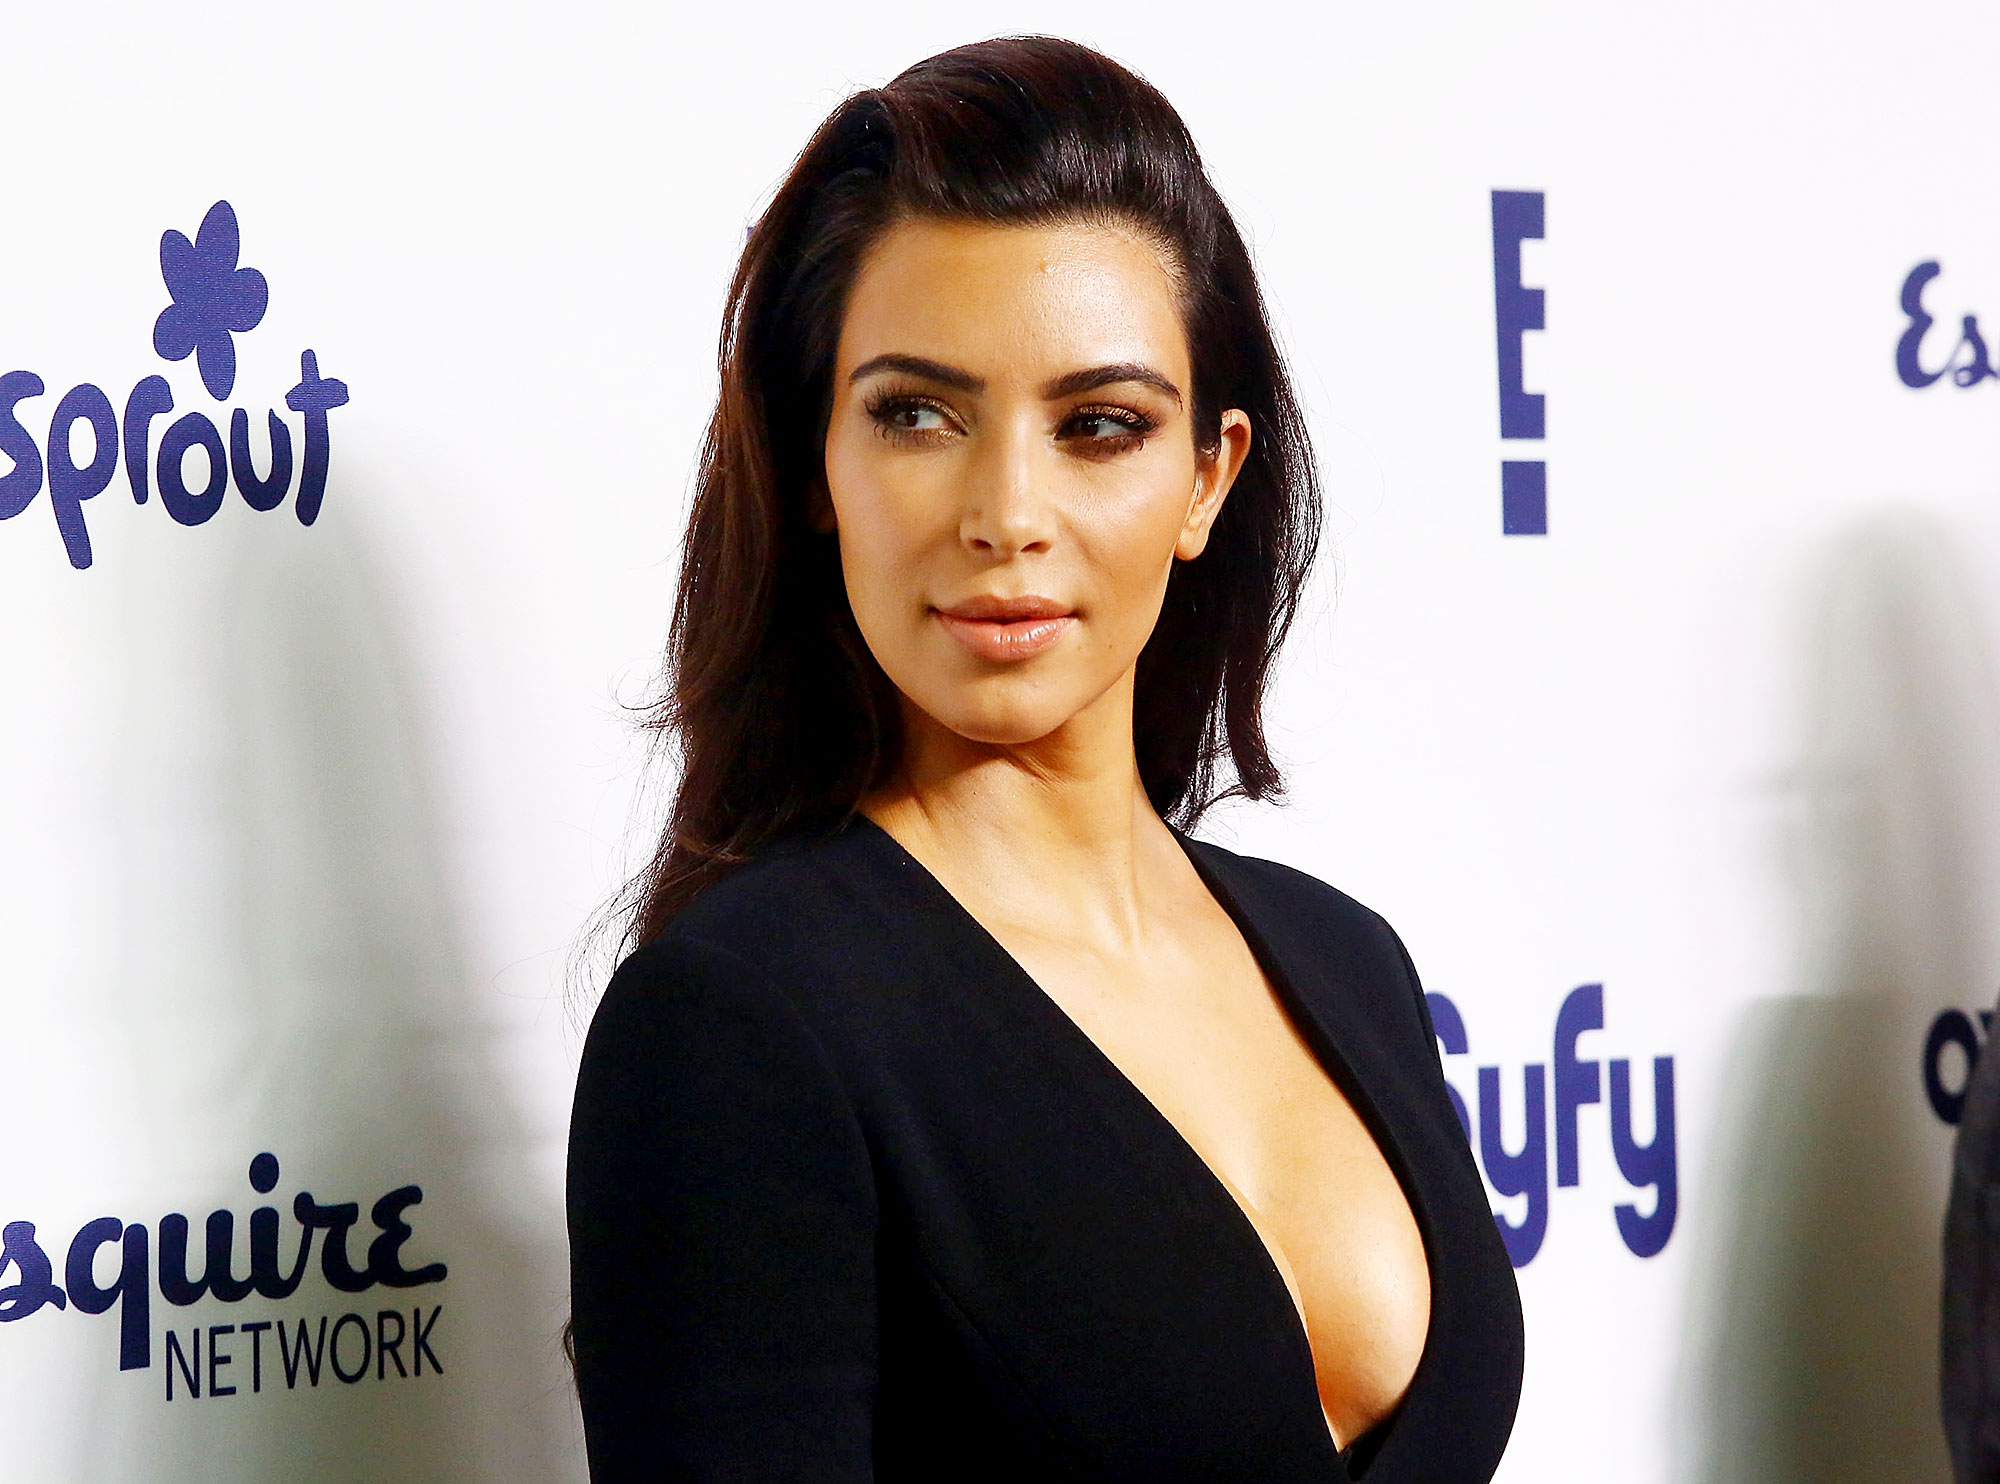 Kim Kardashian Jack In The Box Twitter Complaint